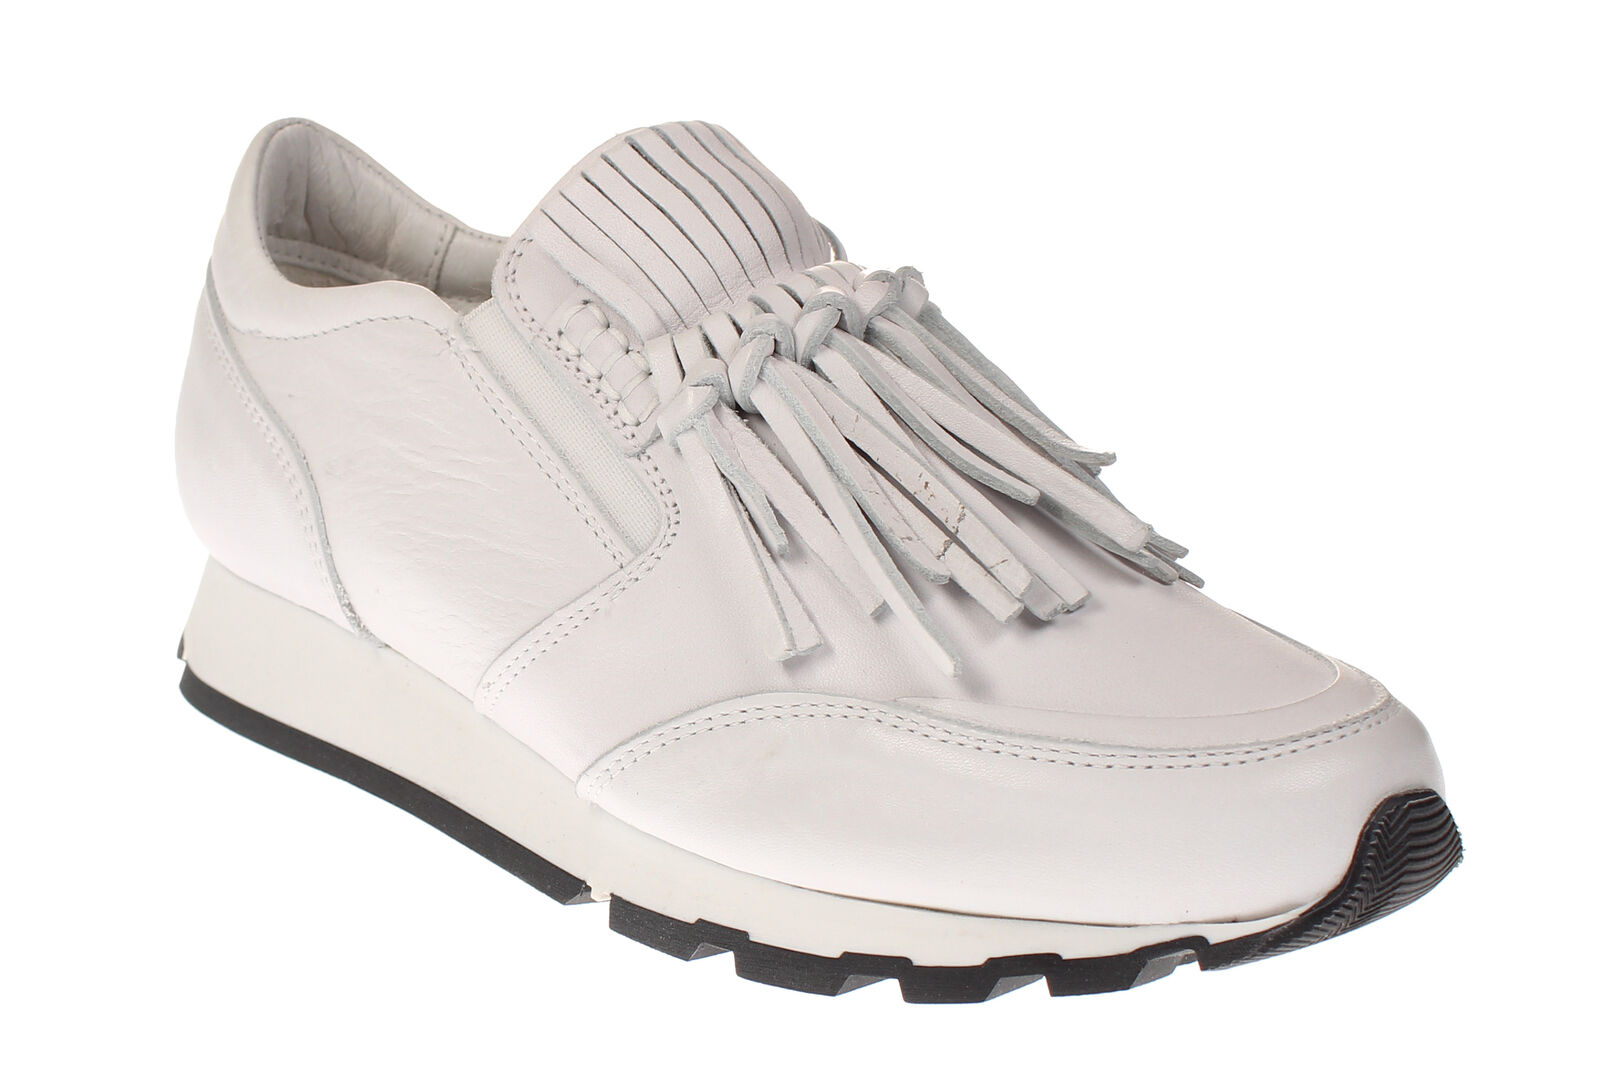 Maca Kitzbühel 2205 - Damen Schuhe Freizeitschuhe Slipper - white-uni